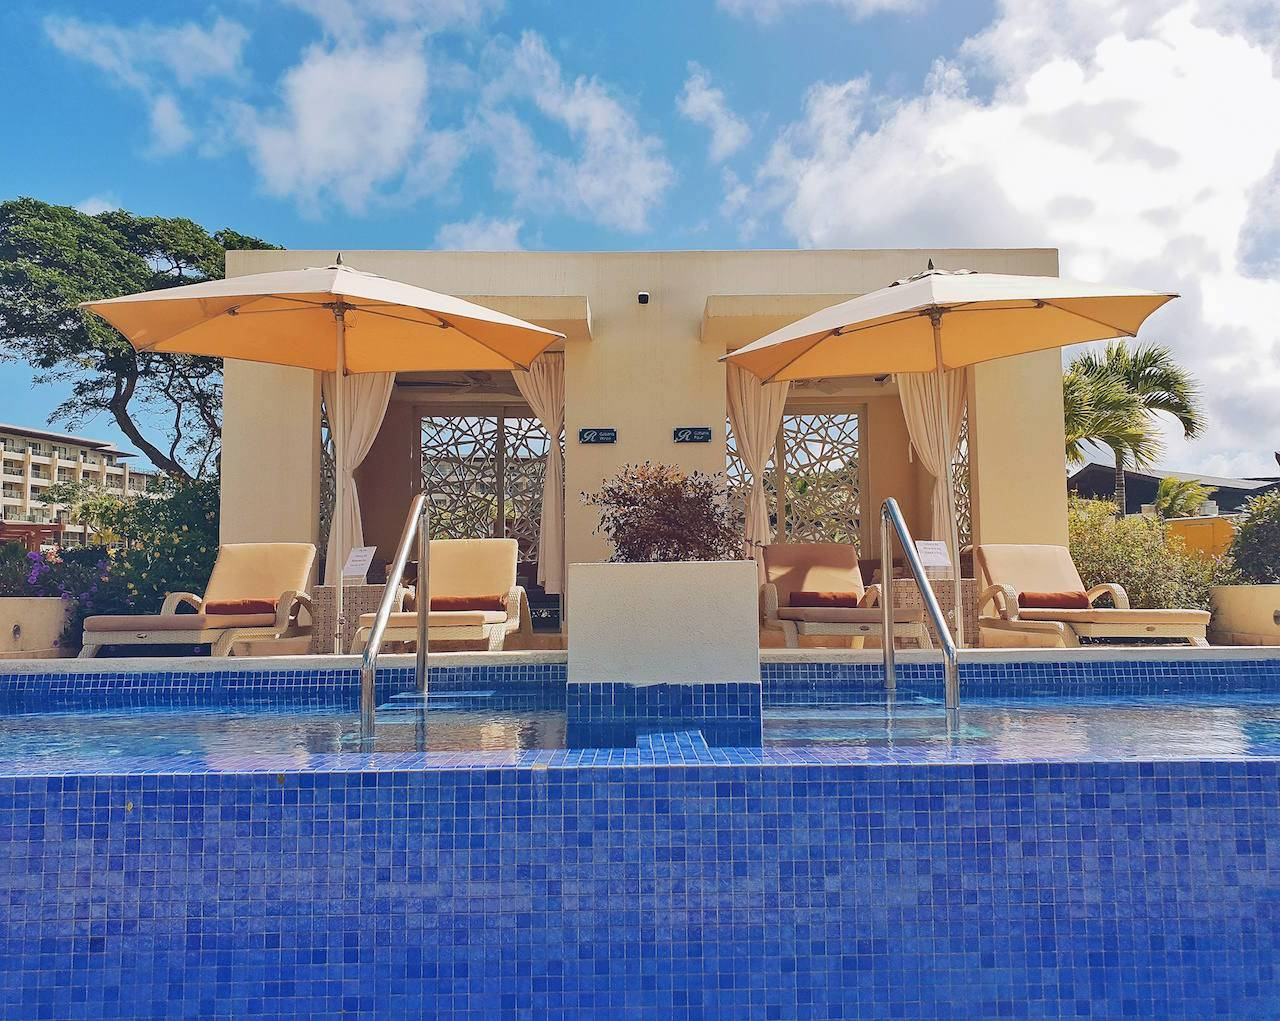 Cabana at Royalton Saint Lucia